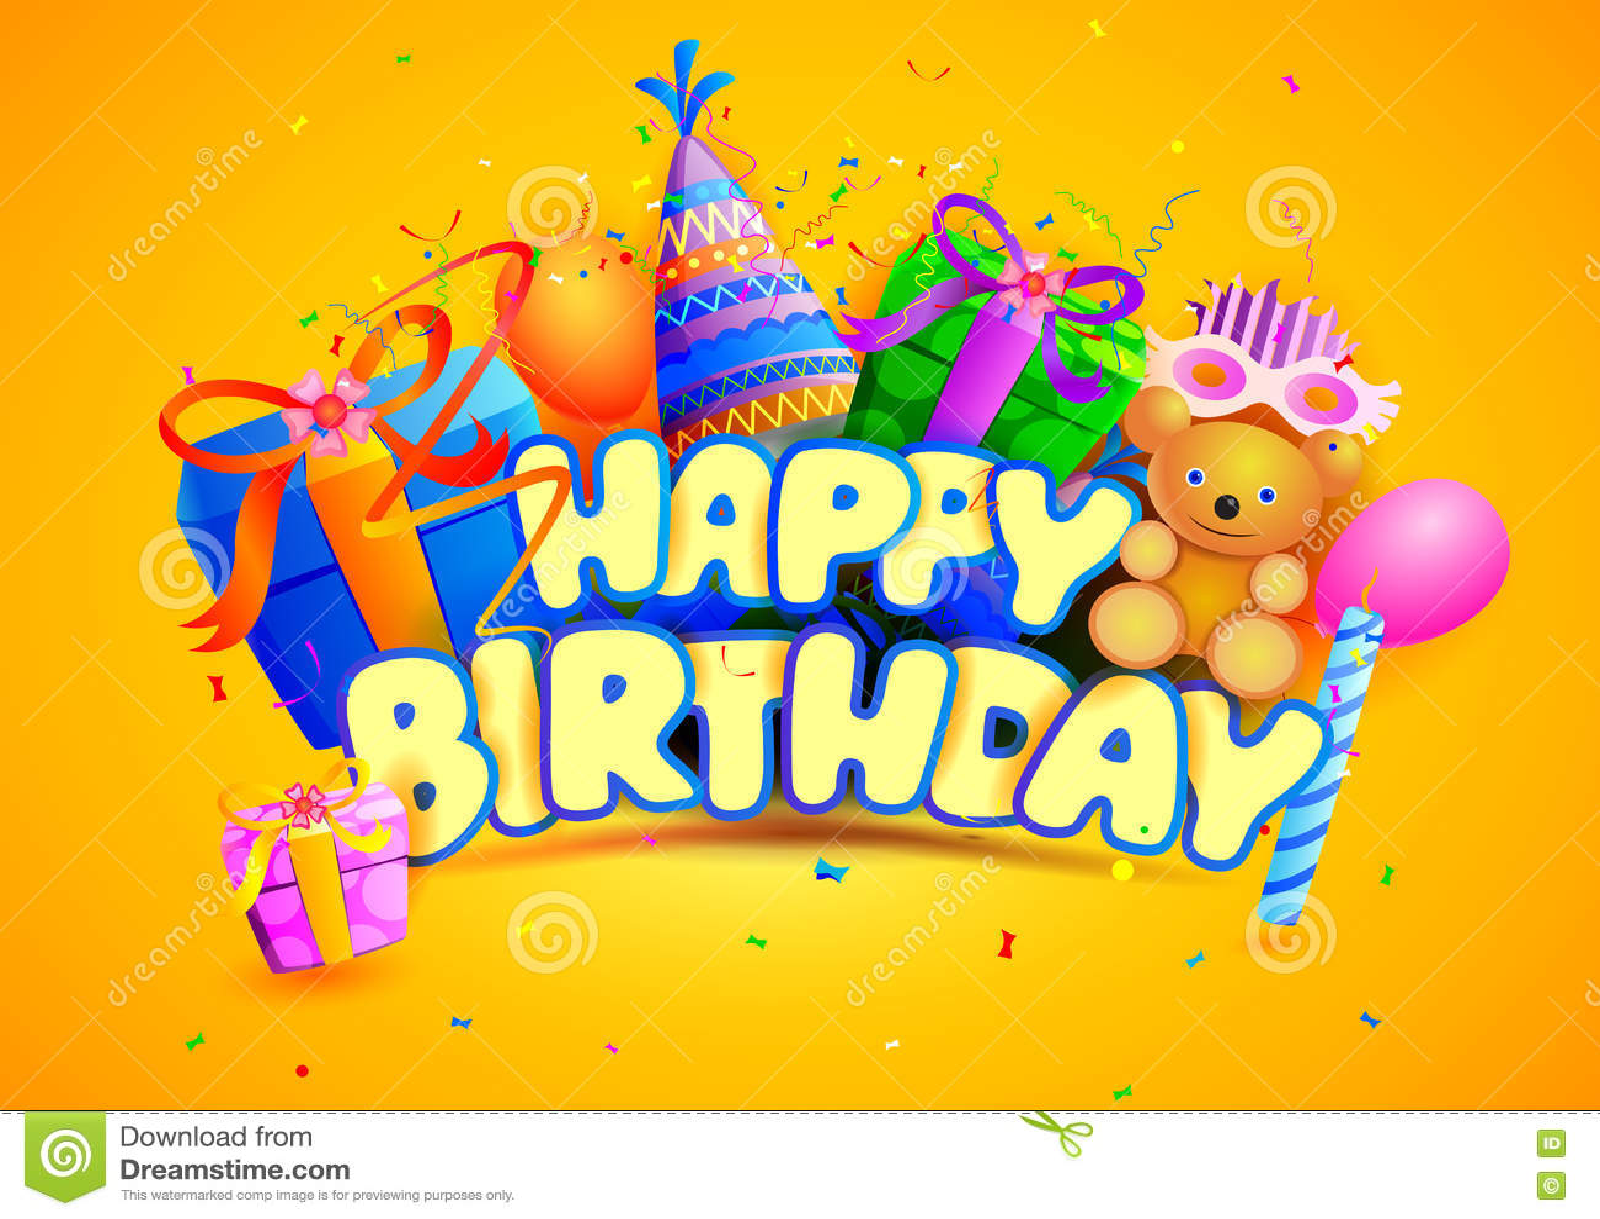 Happy anniversary cake free vector download free vector